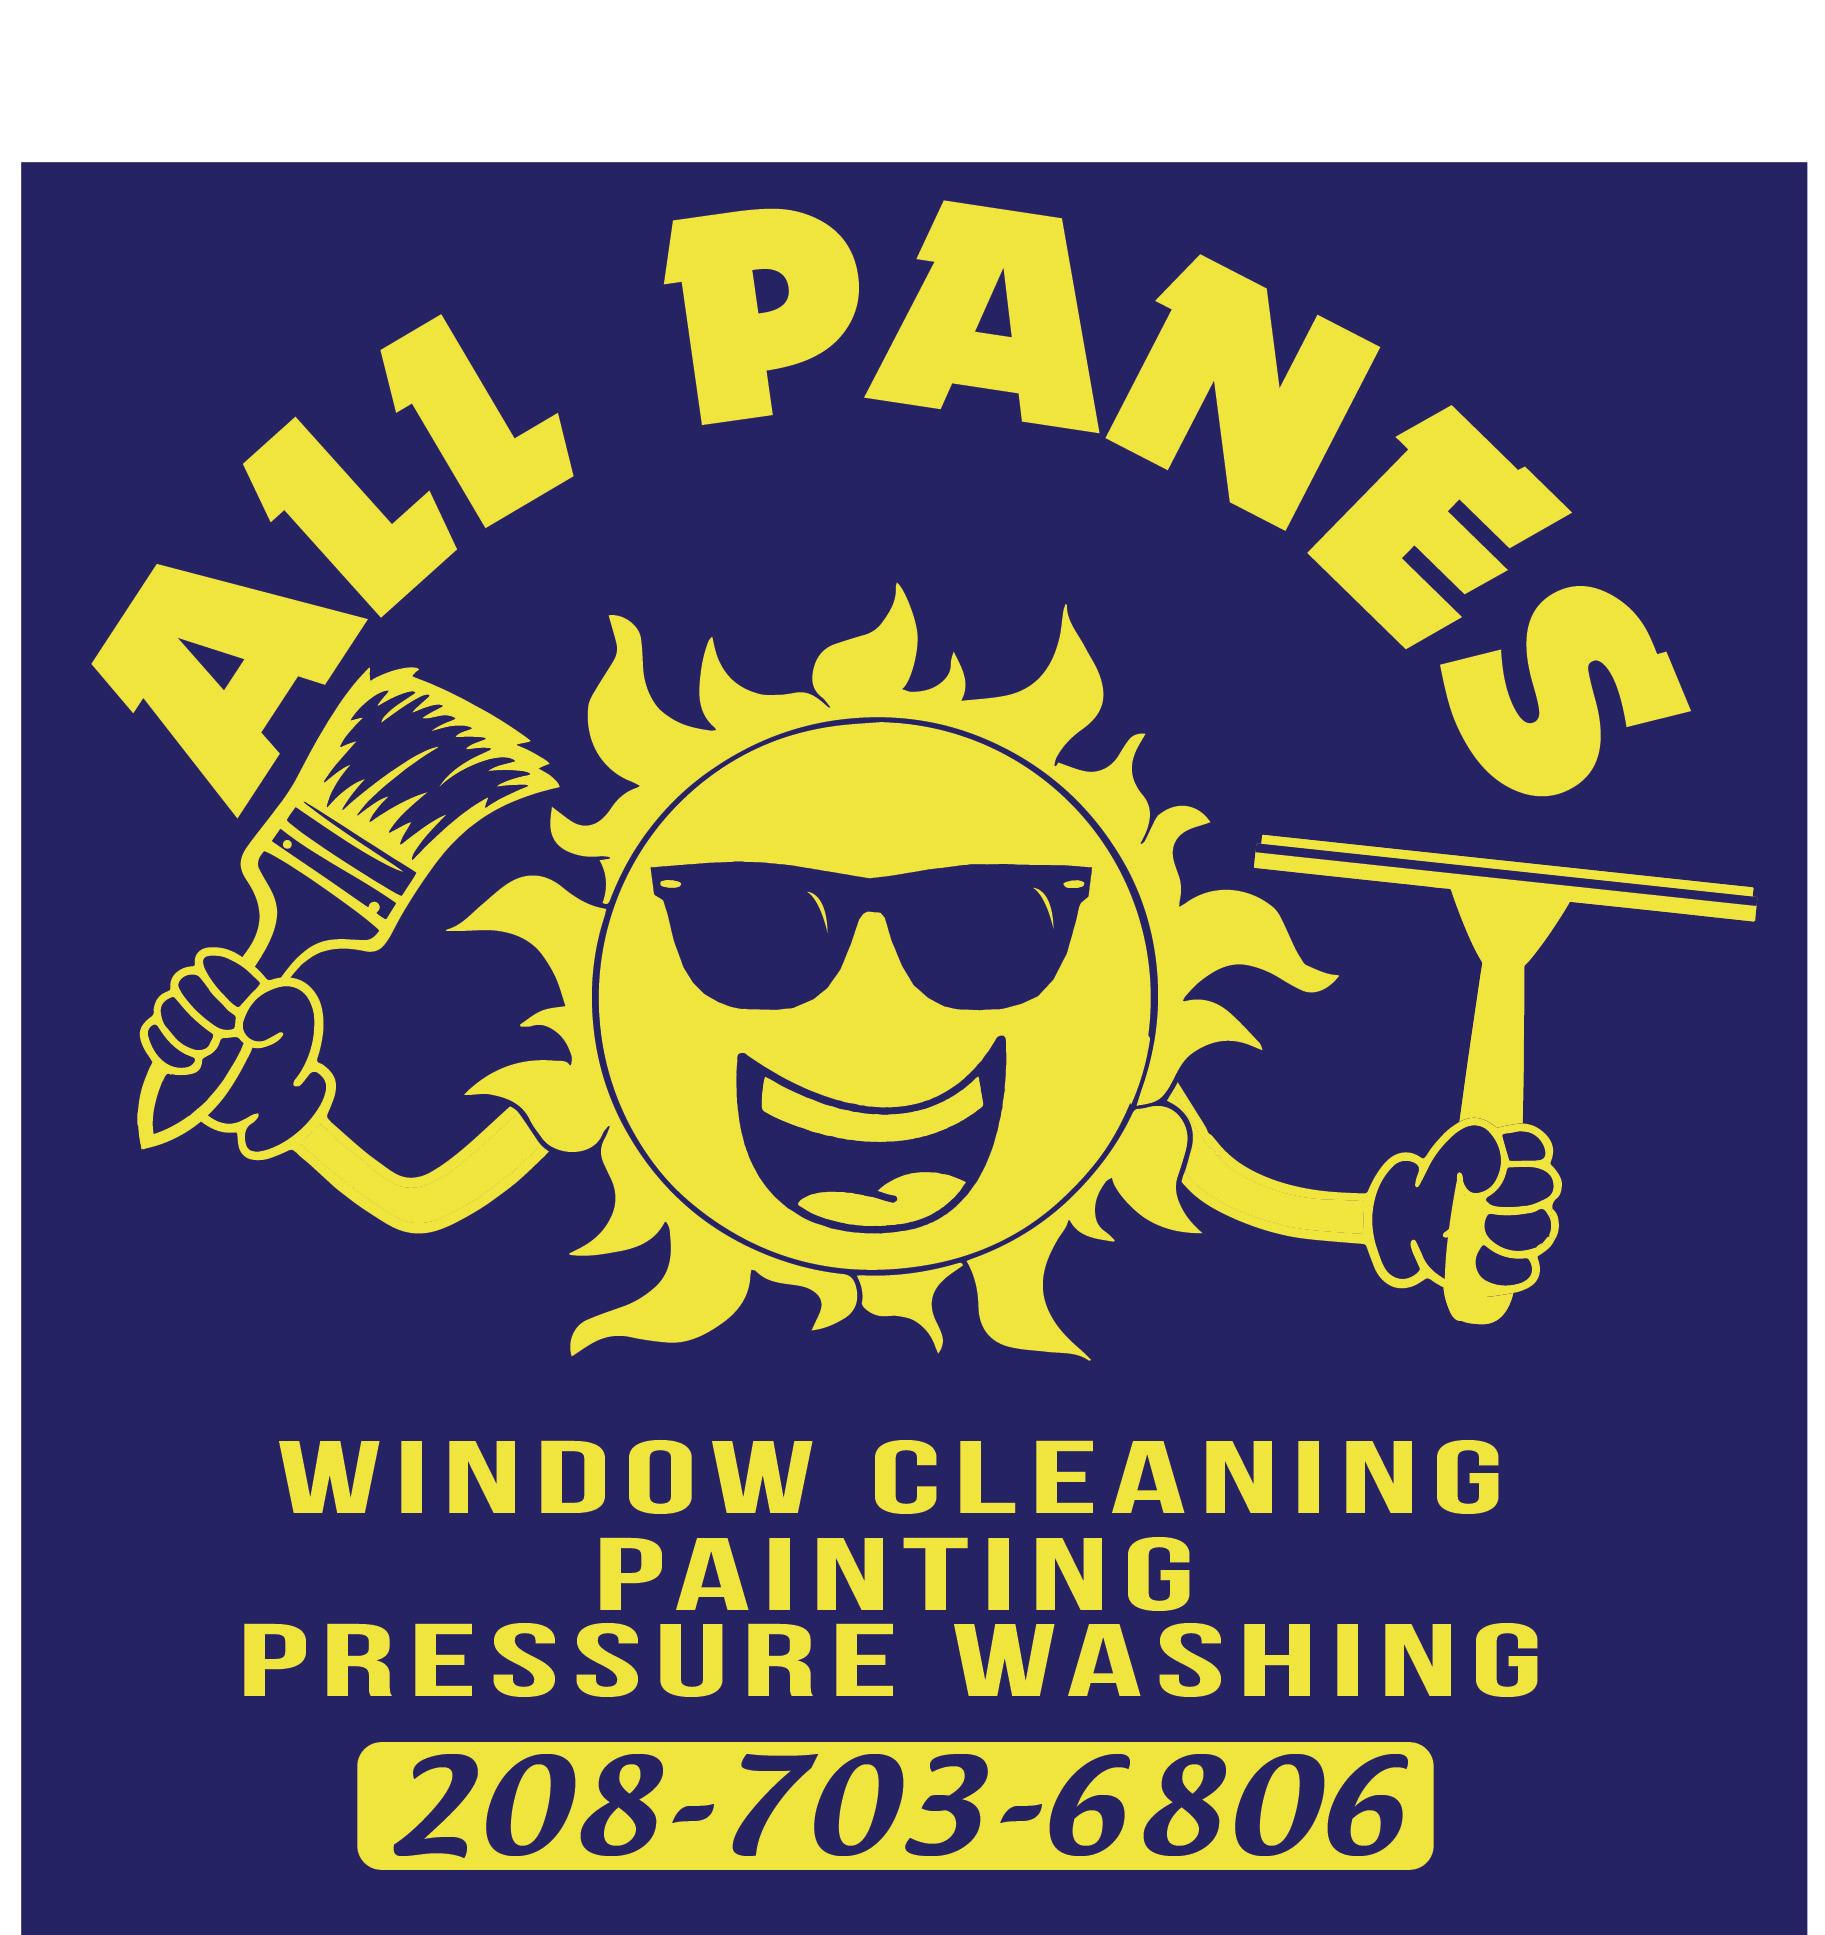 window cleaning boise yelp residential window cleaning boise meridian painters pressure washing epoxy floor coatings